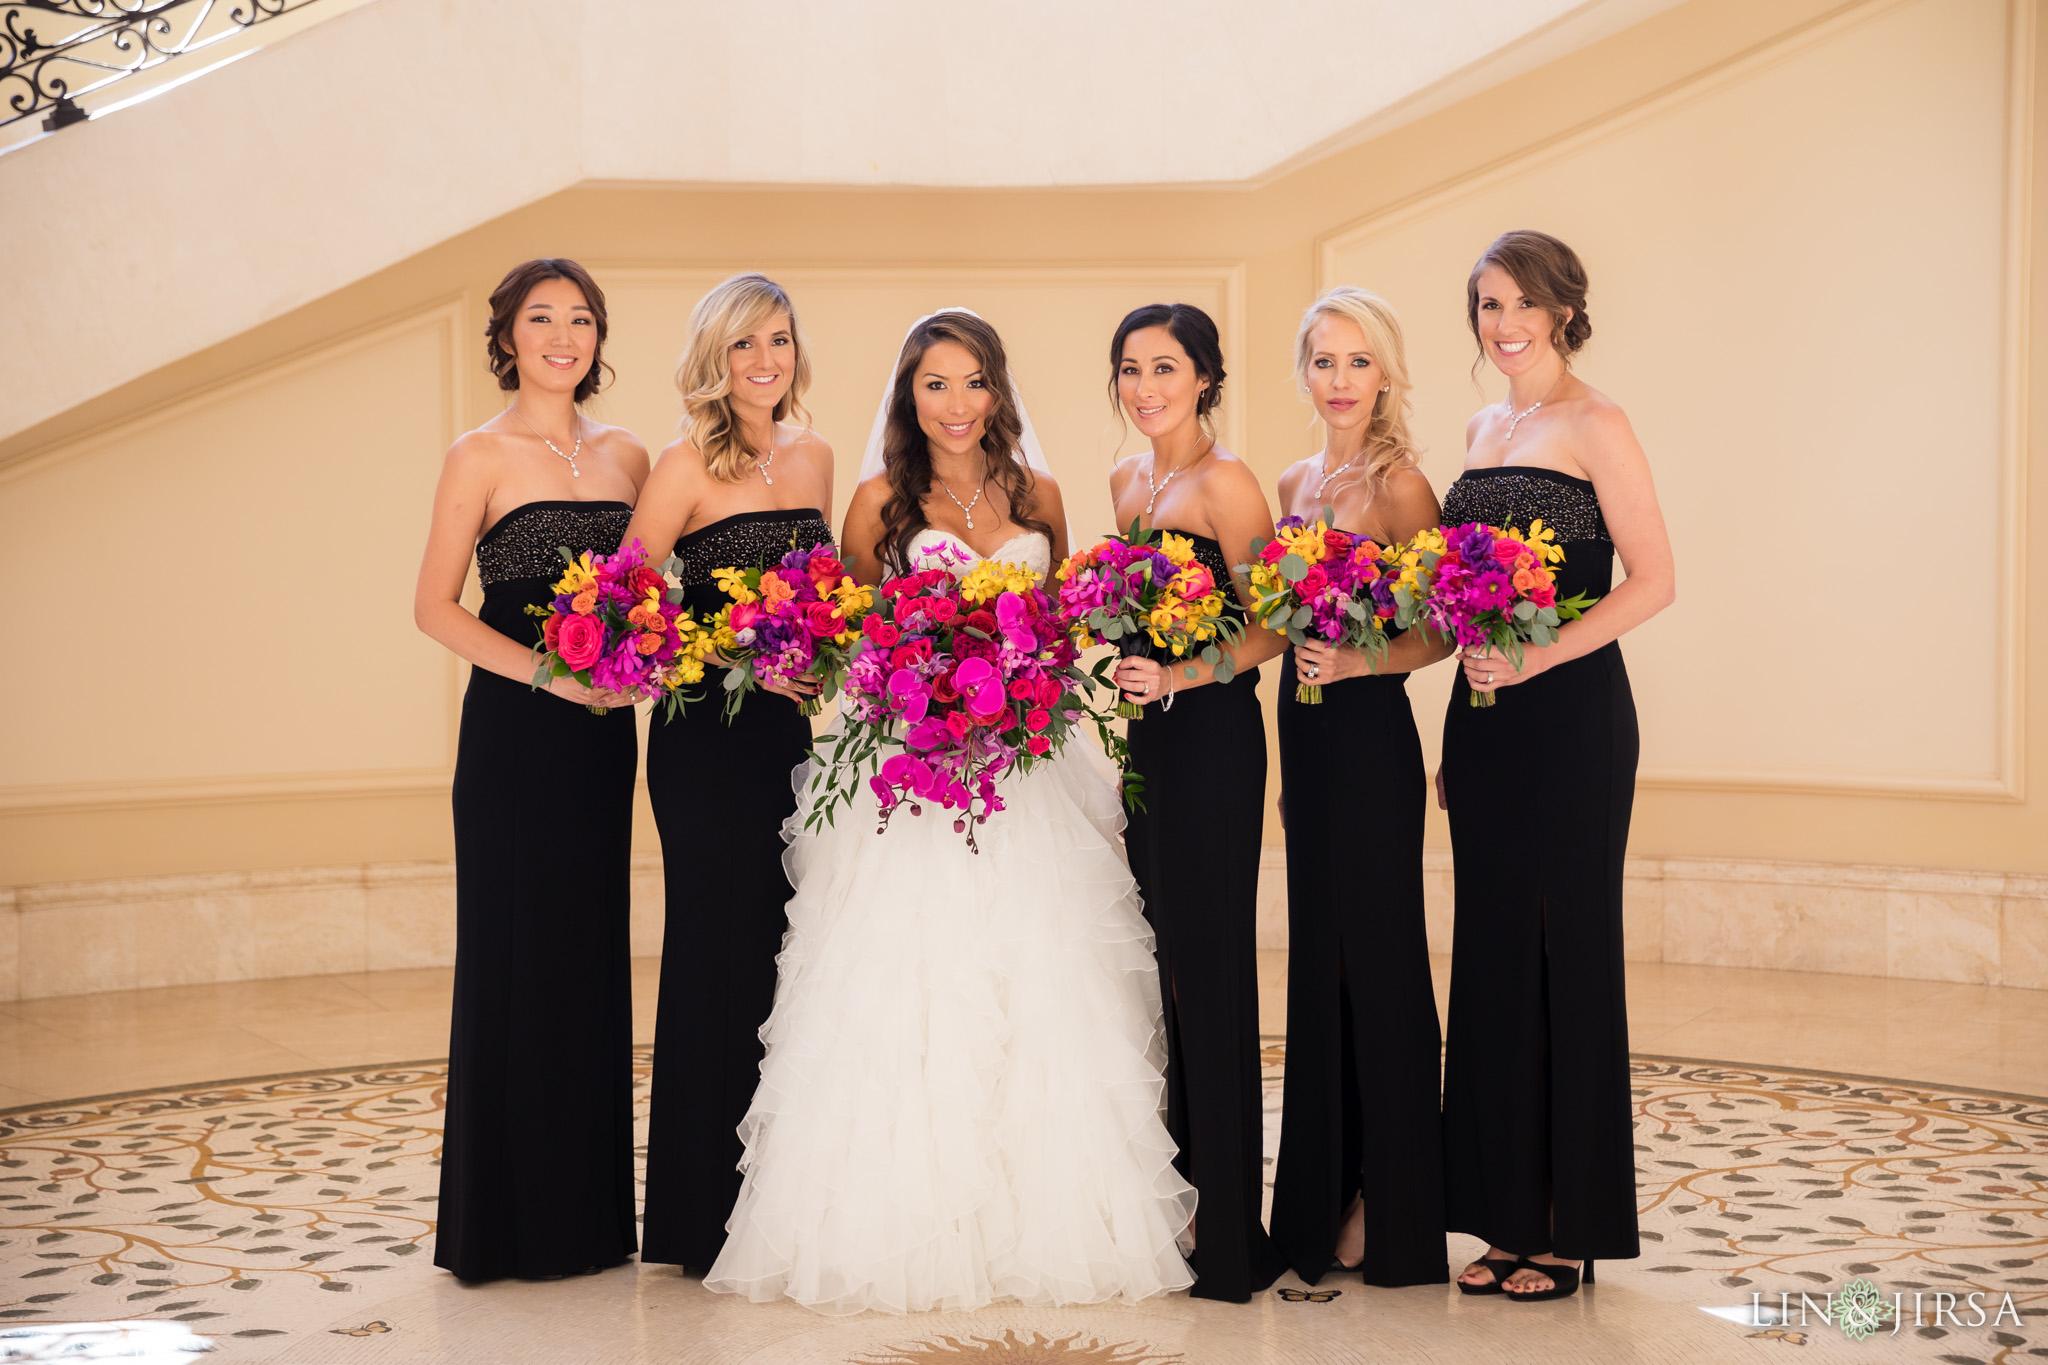 07 monarch beach resort bridesmaids wedding photography